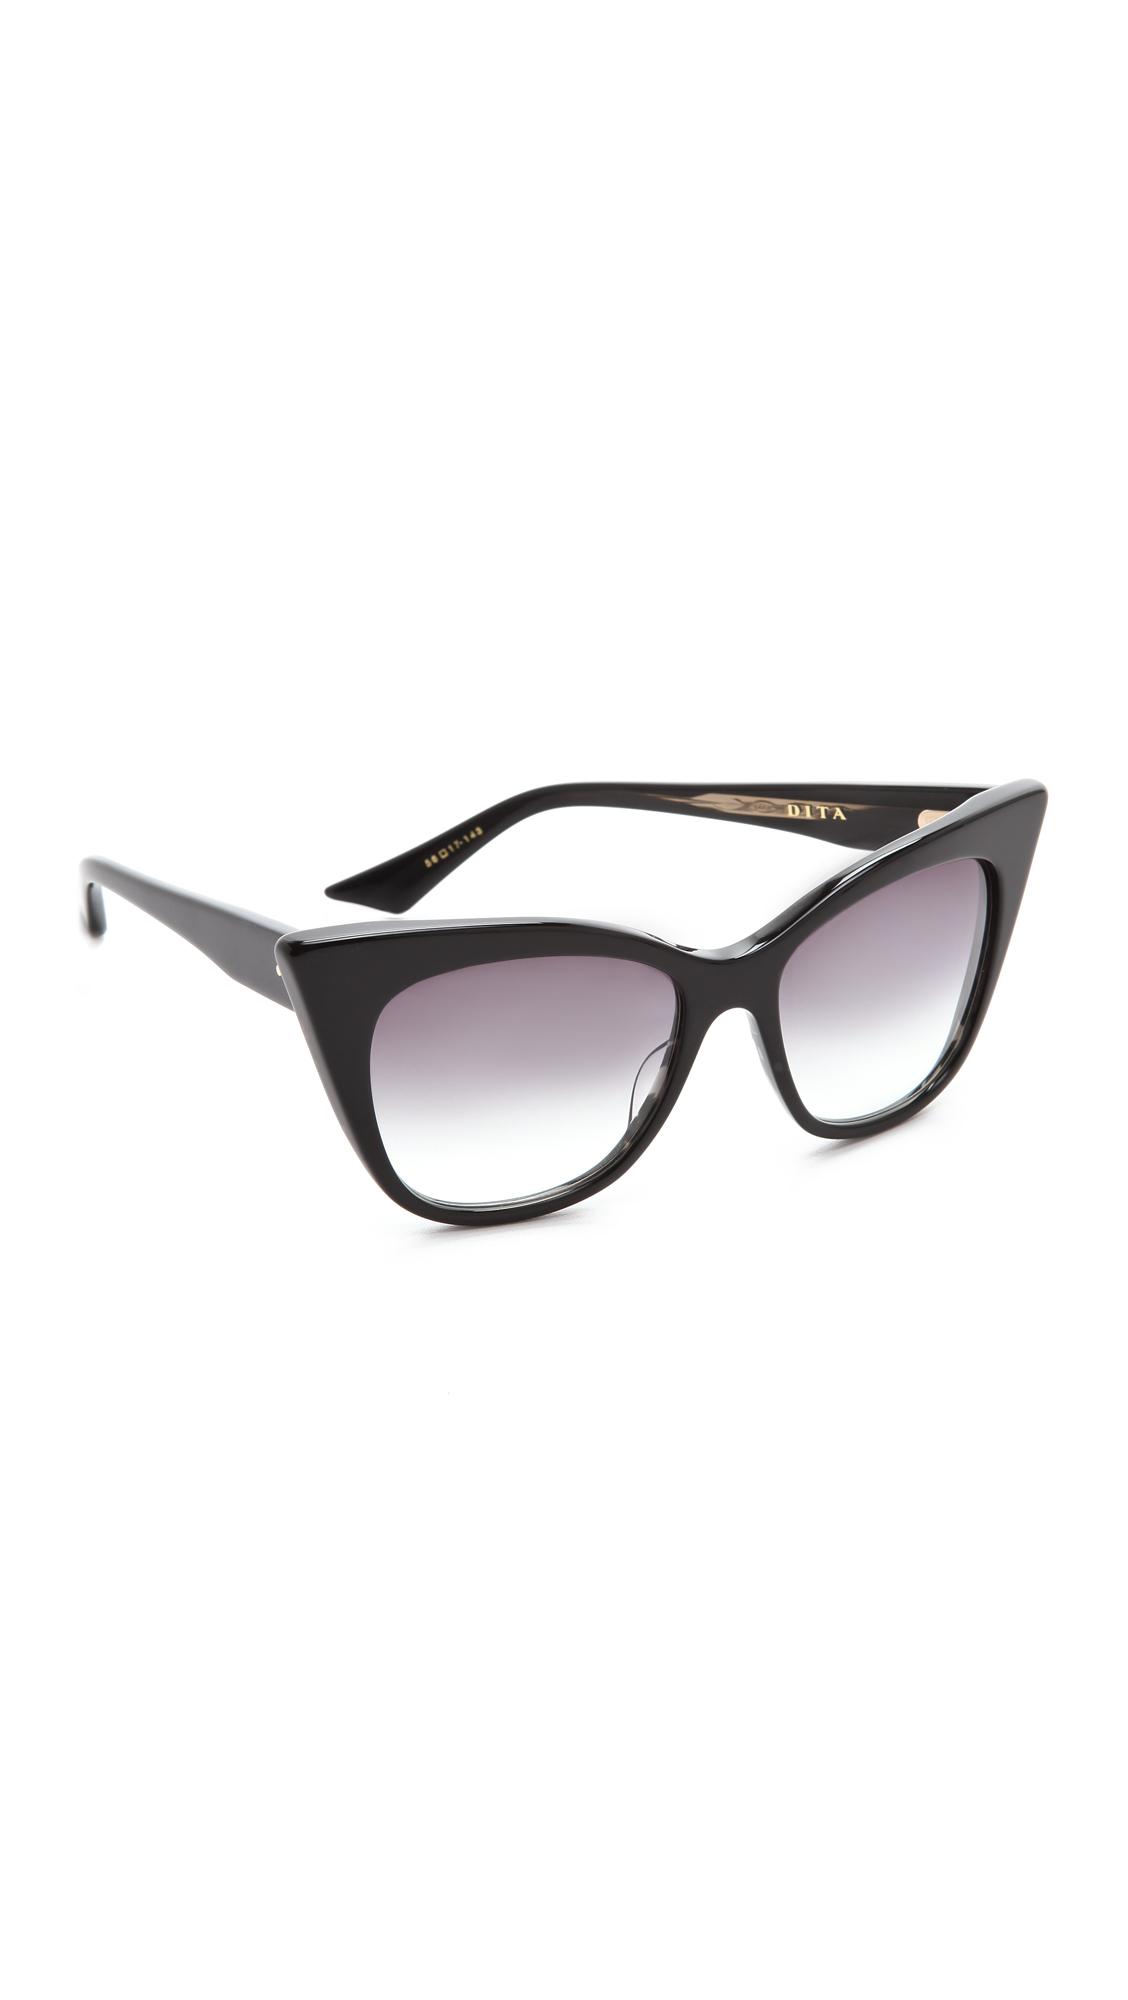 aae9255974d0 Dita Eyewear New York